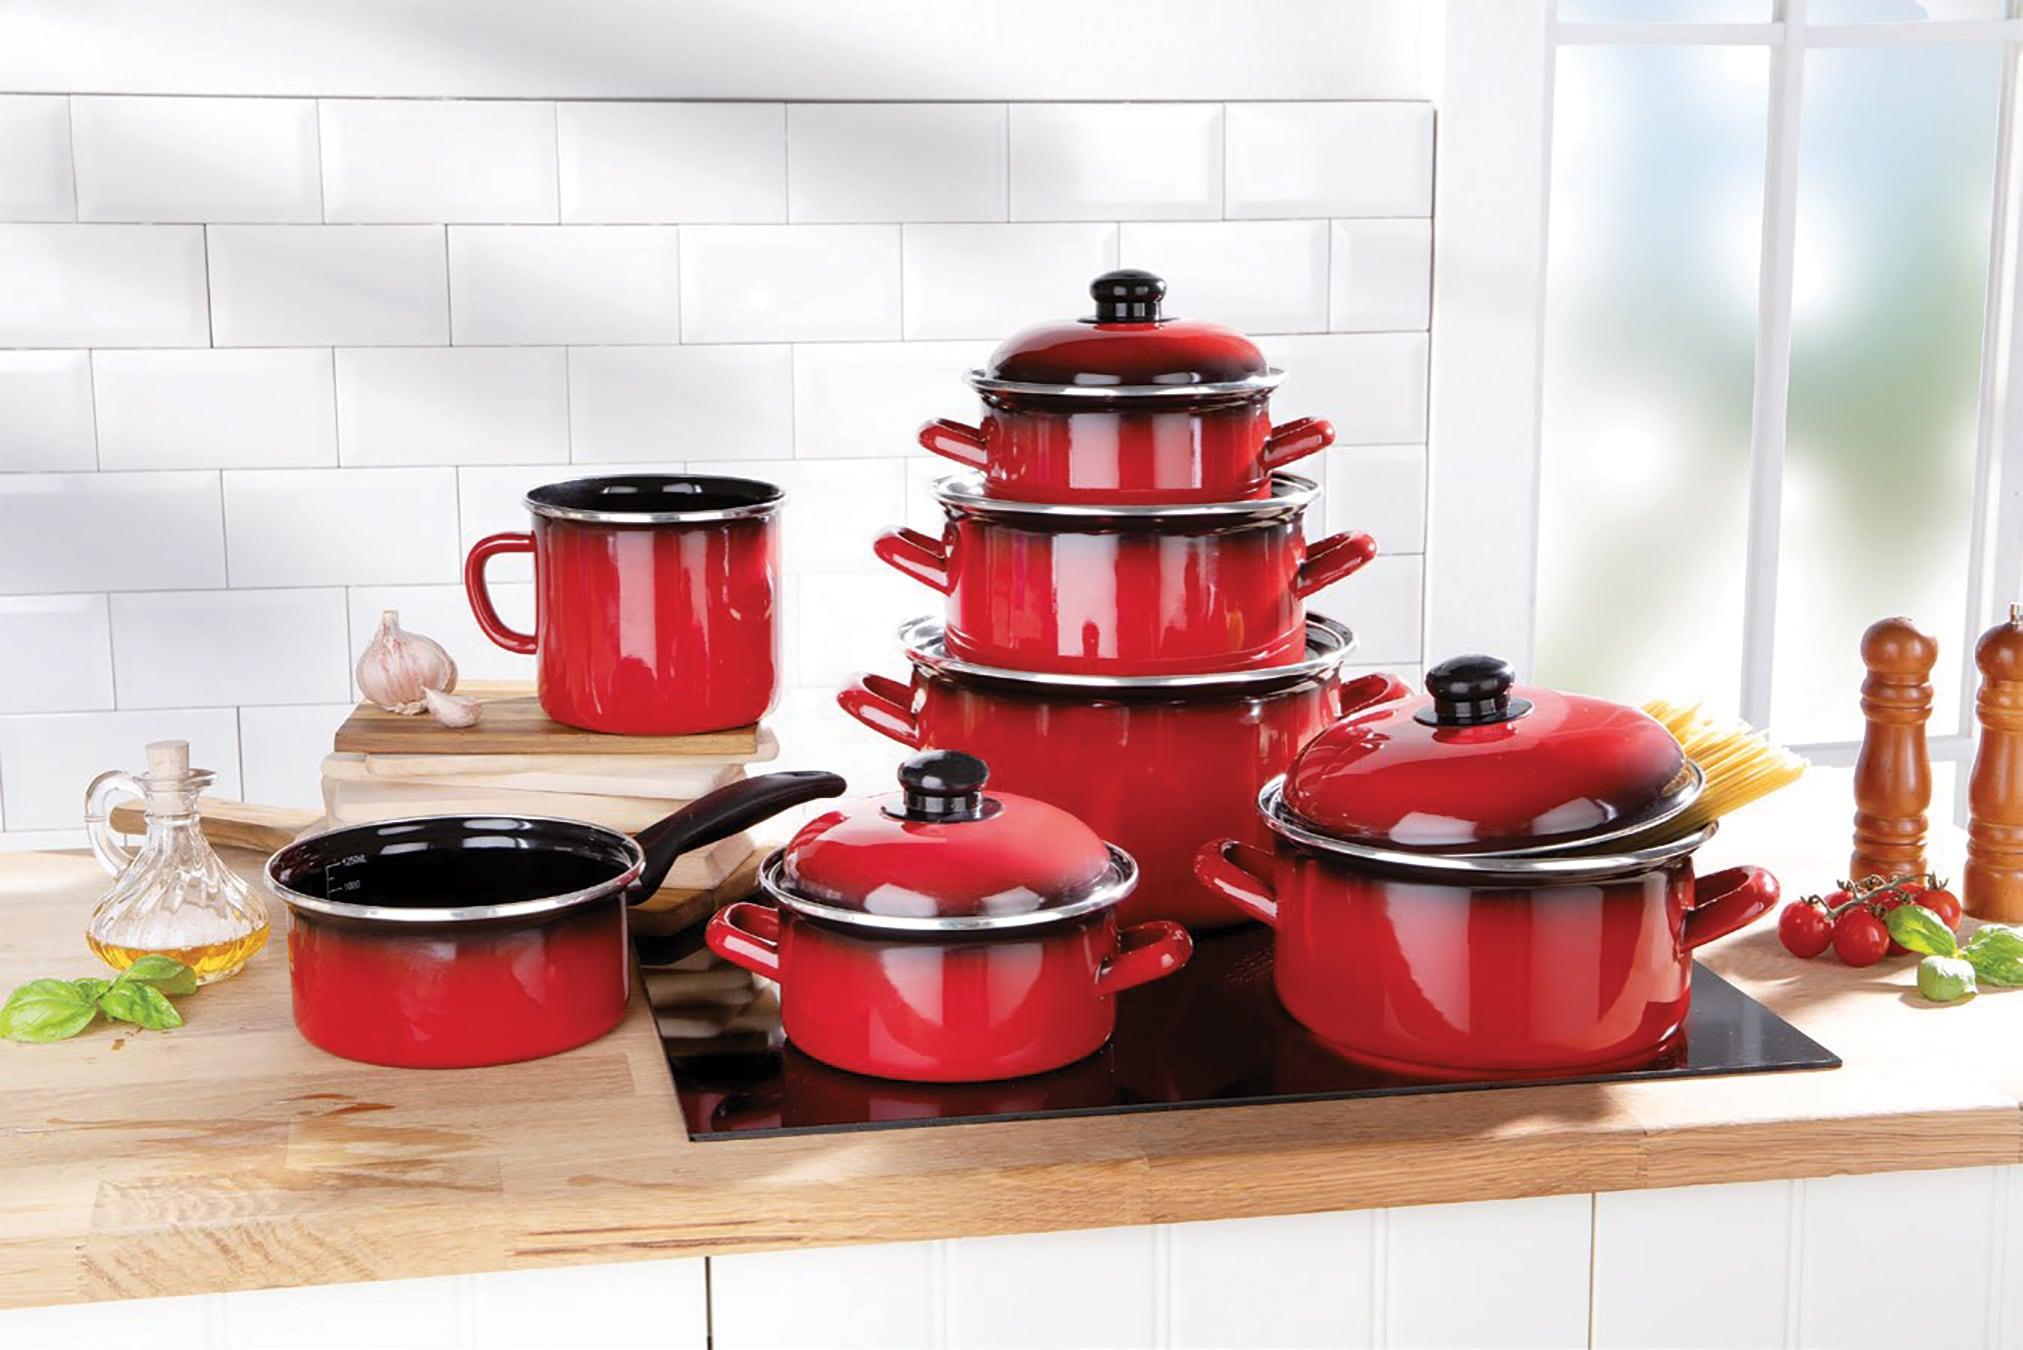 bemus Topf-Set Red Fire, emailliertes Stahlblech, (Set, 7 tlg.), Induktion rot Topfsets Töpfe Haushaltswaren